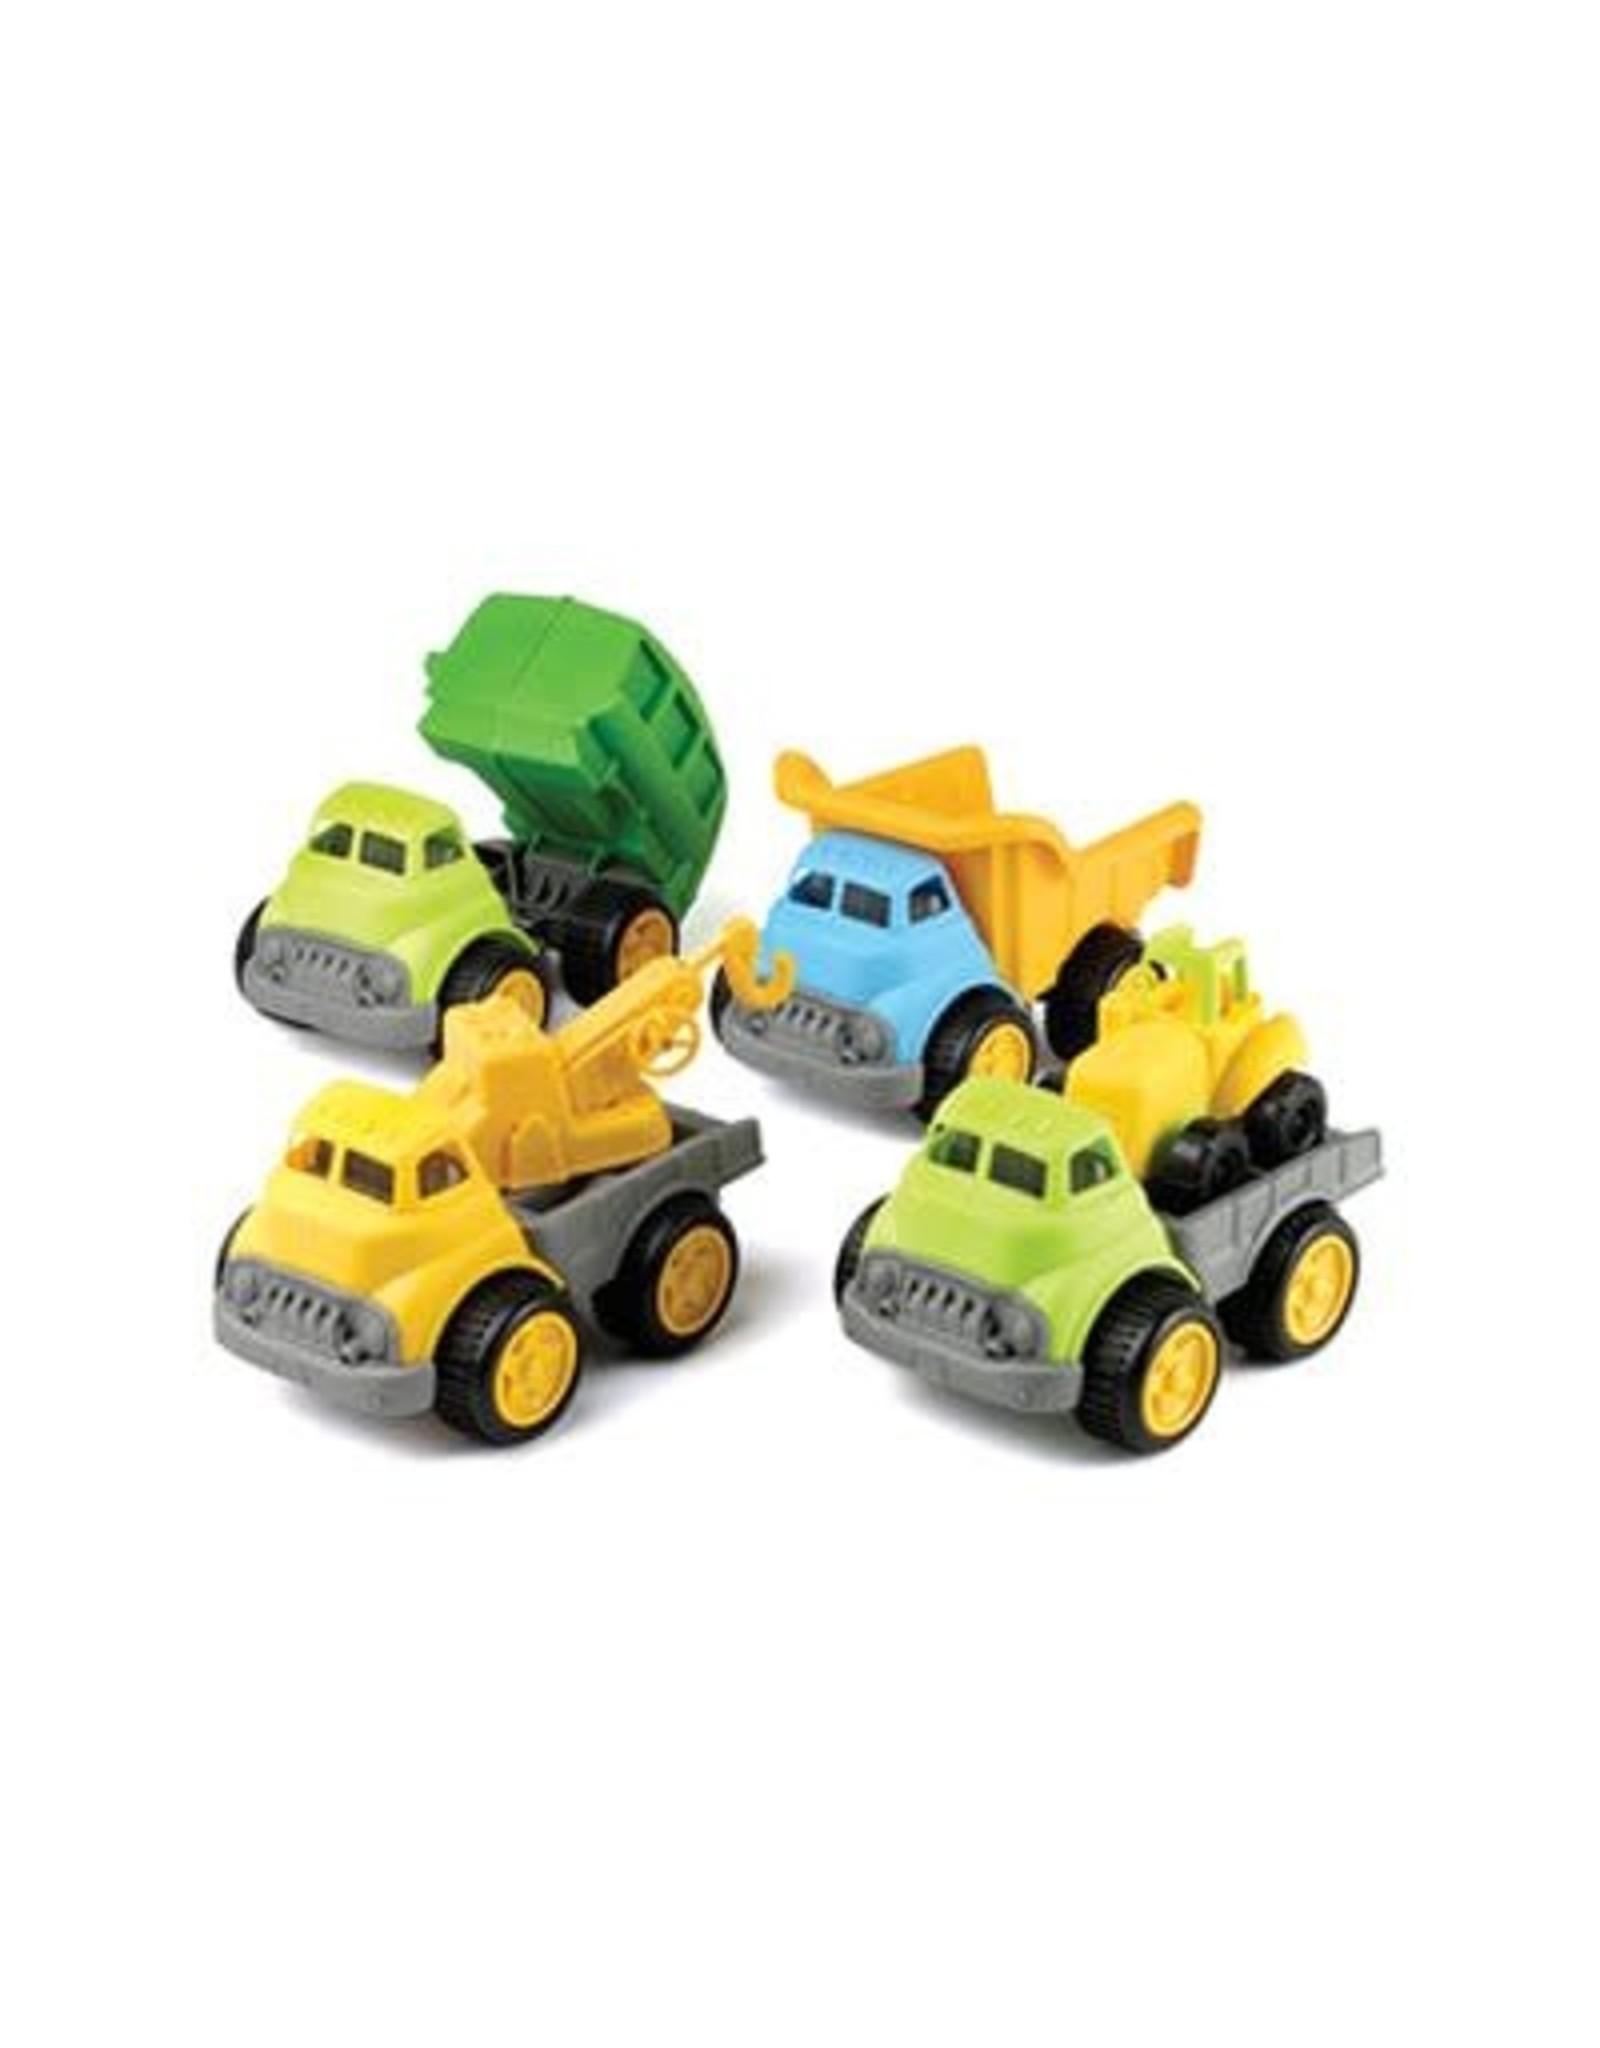 Playwell Construction Trucks 4 Pack